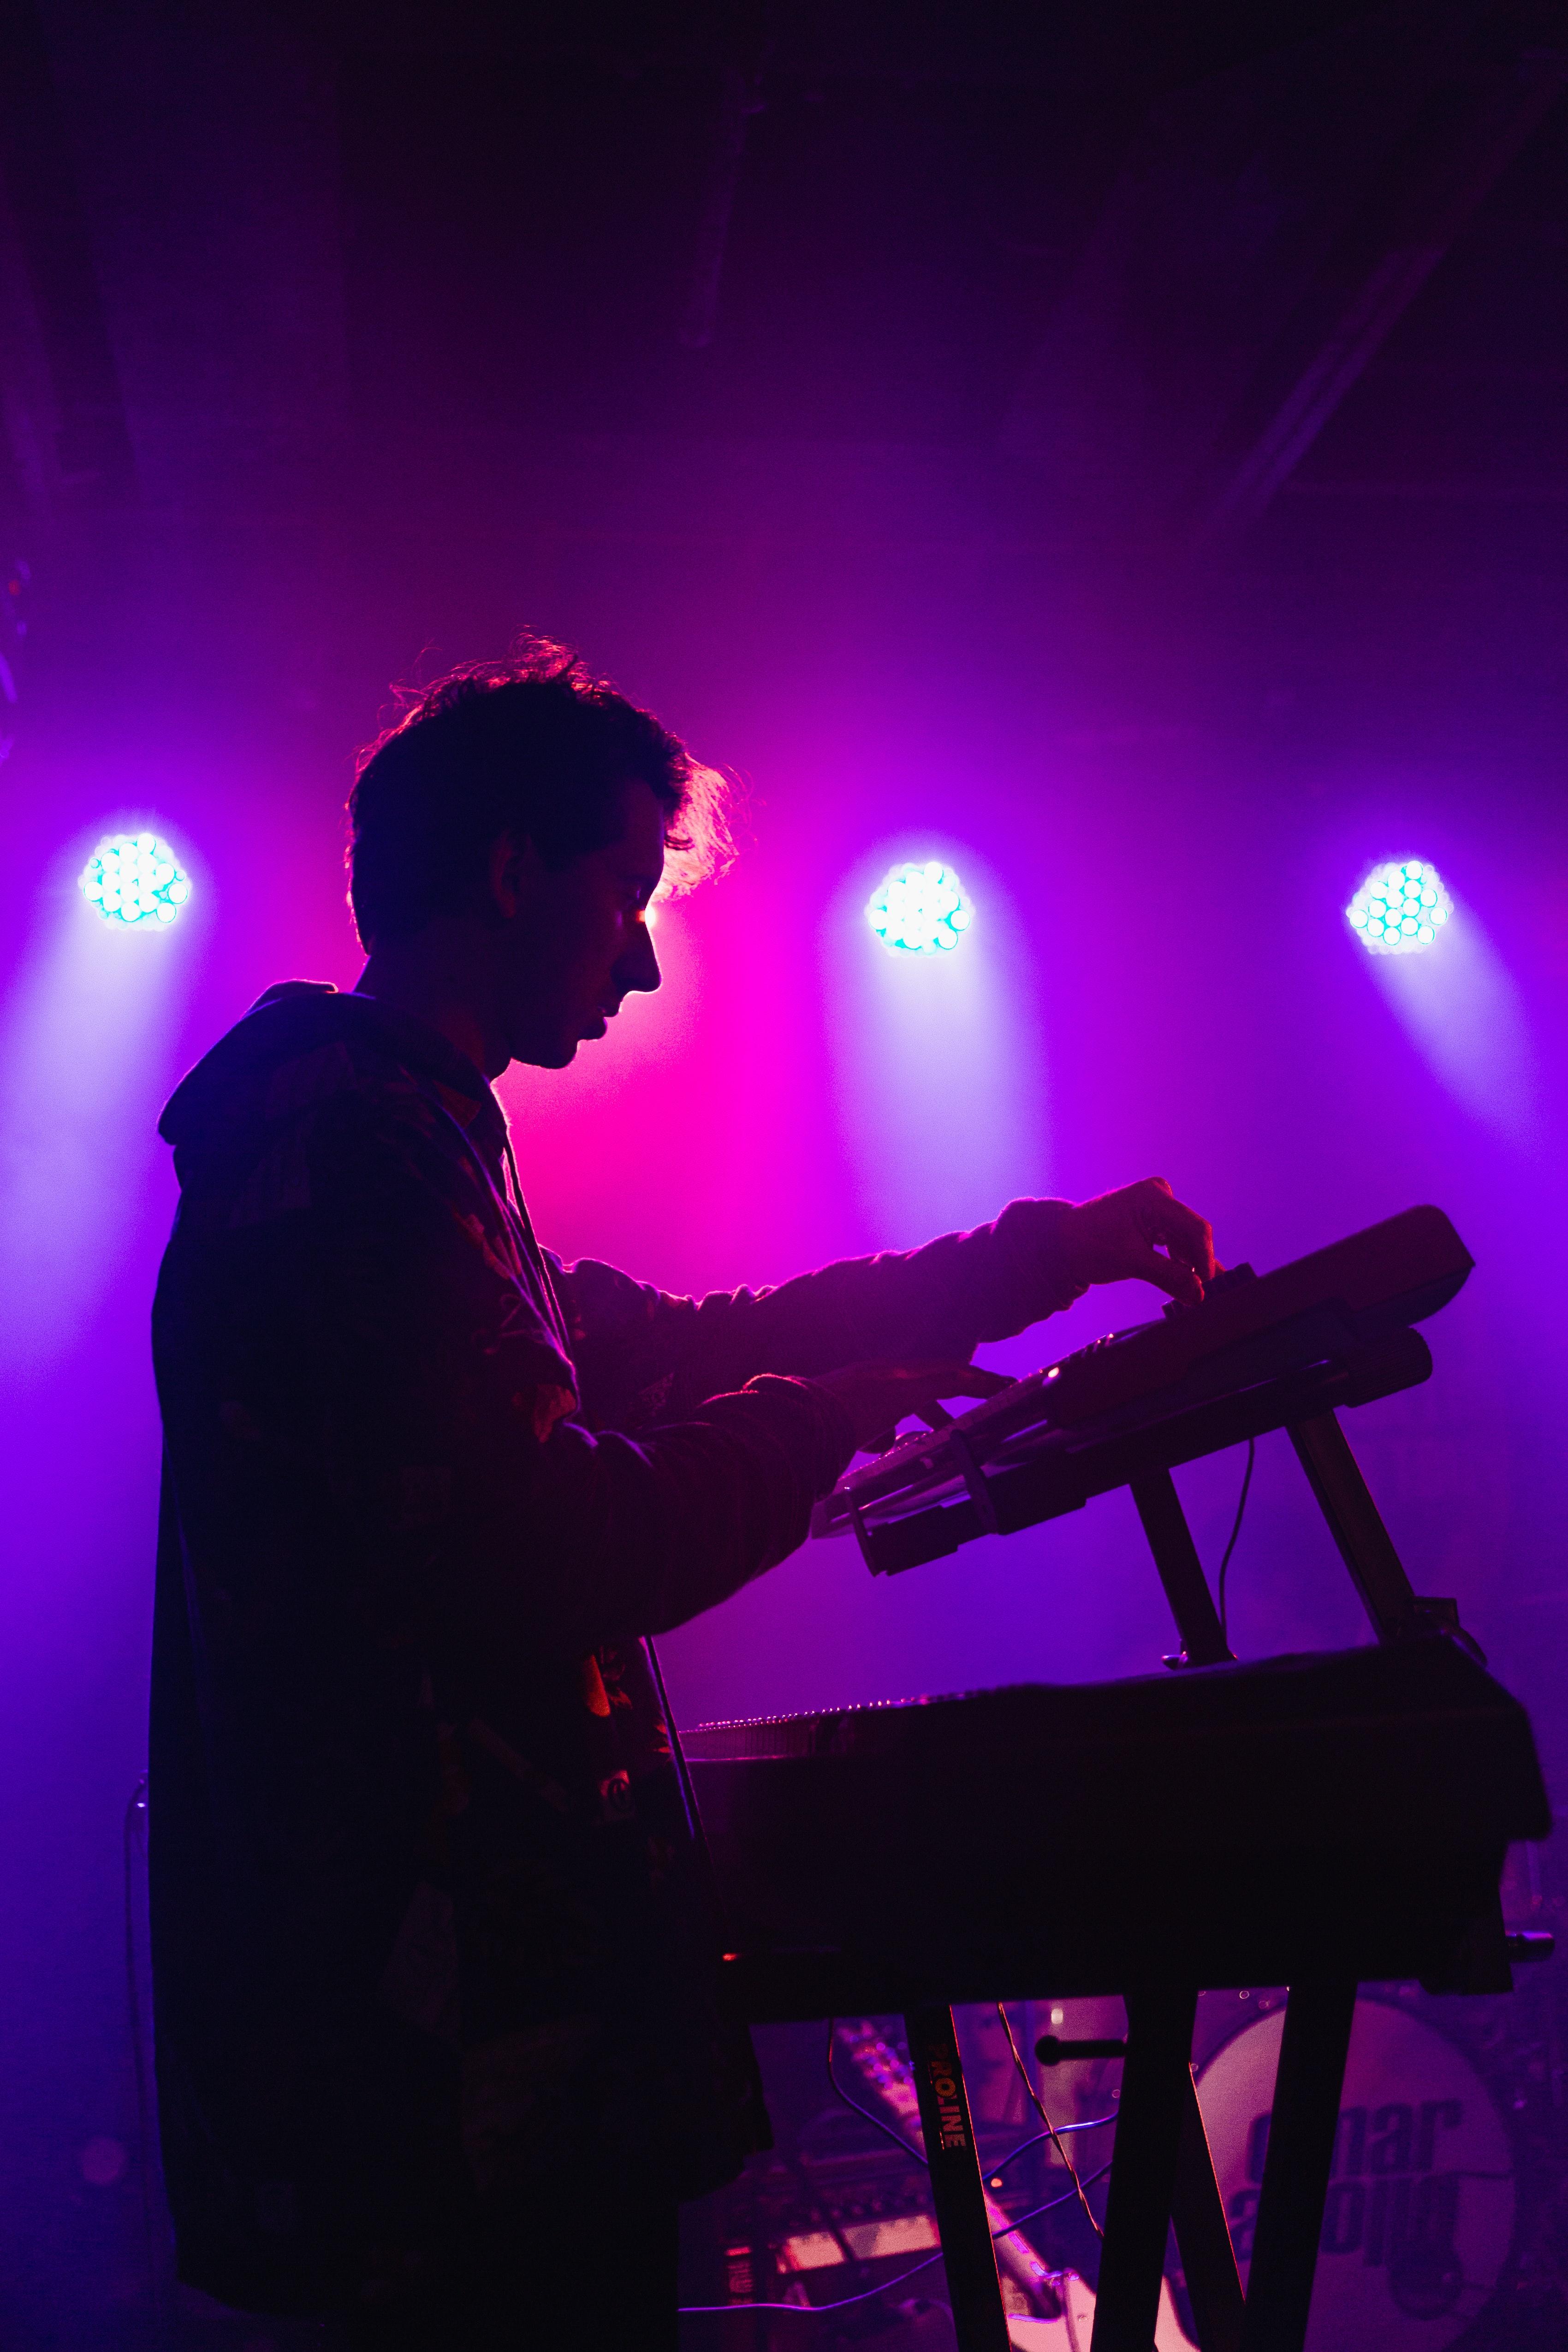 man-holding-dj-mixer-machine-2350325